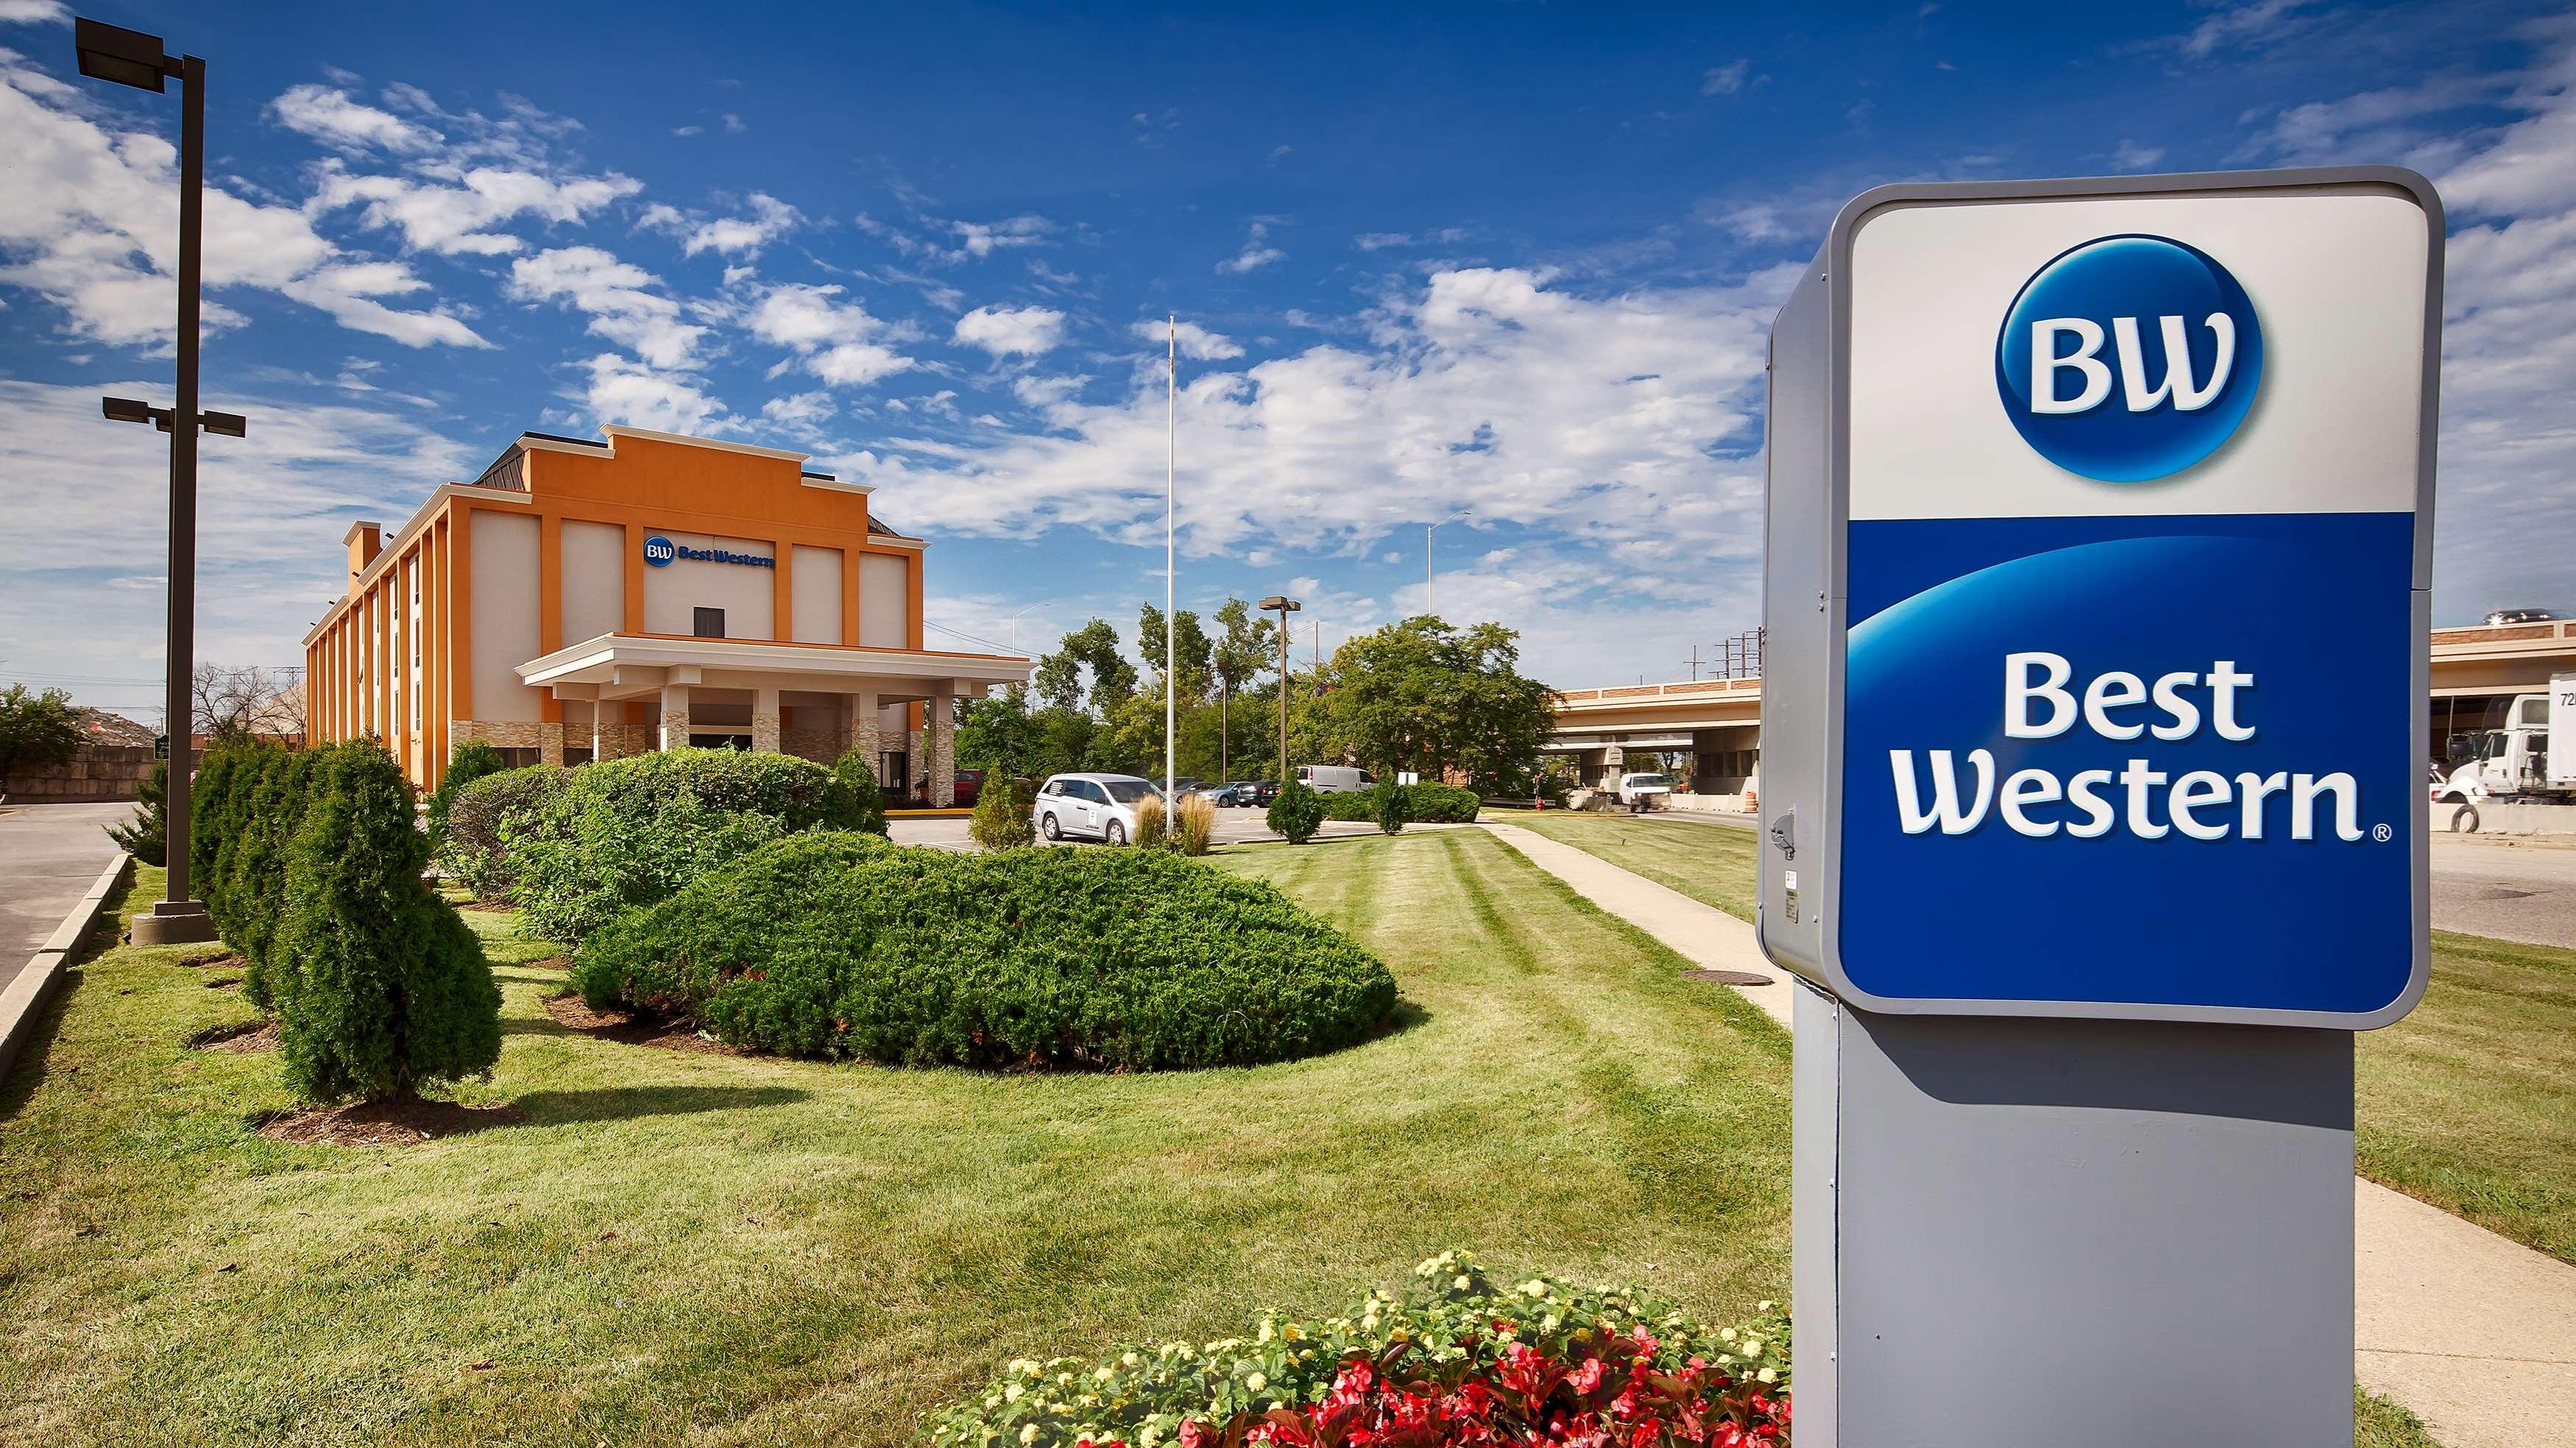 Best Western O Hare Hotel